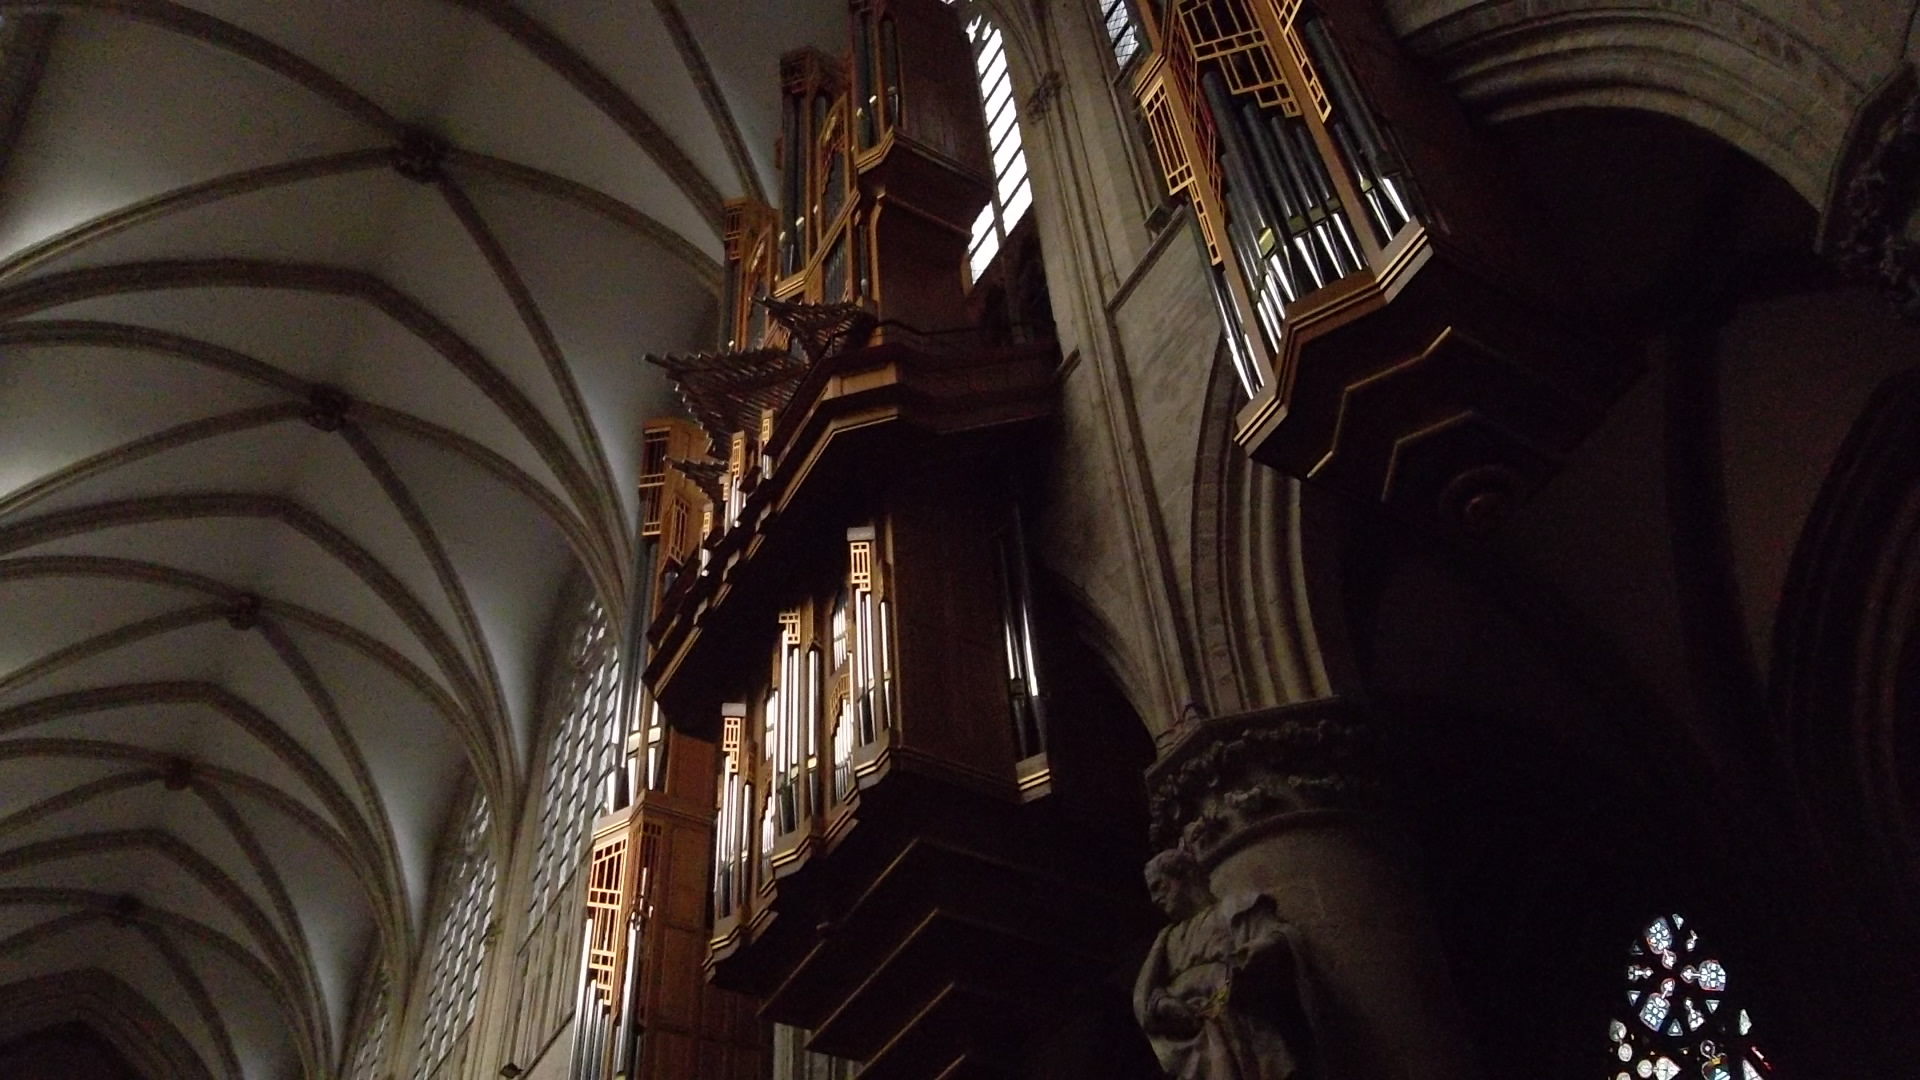 bru-cathedral-st-michel-st-gudule-organ-dec12